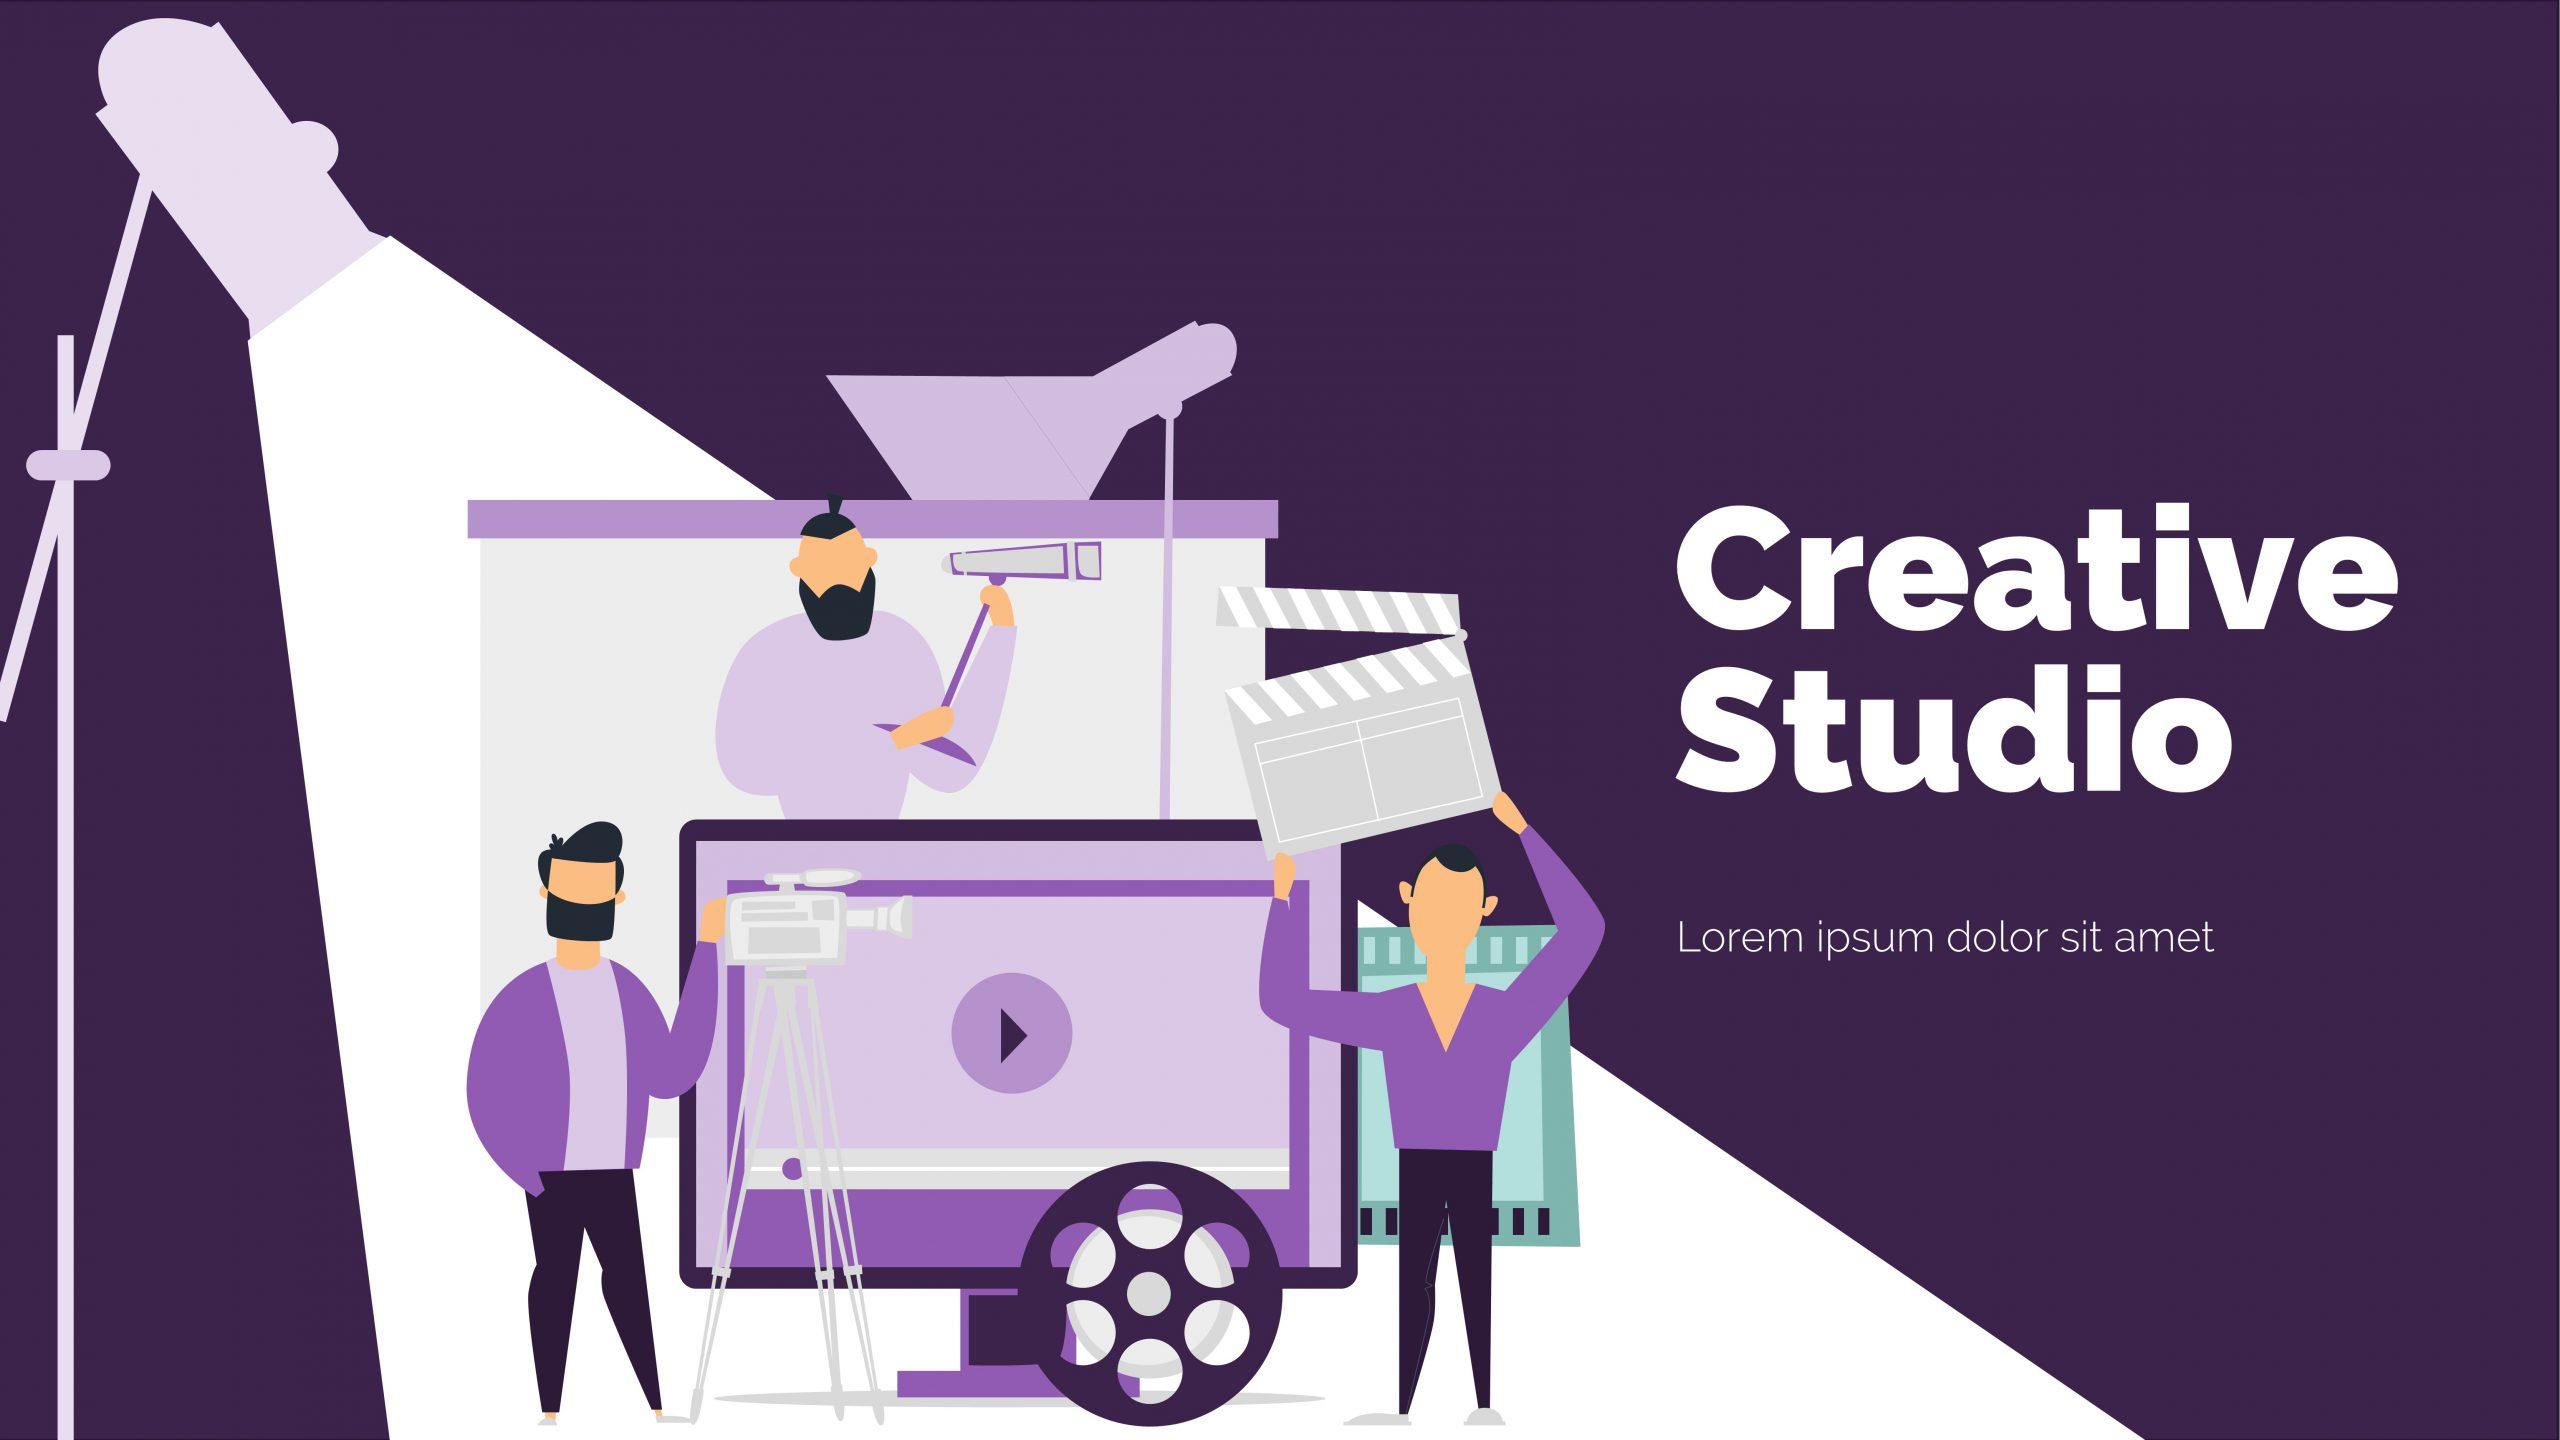 presentation template of Creative Studio